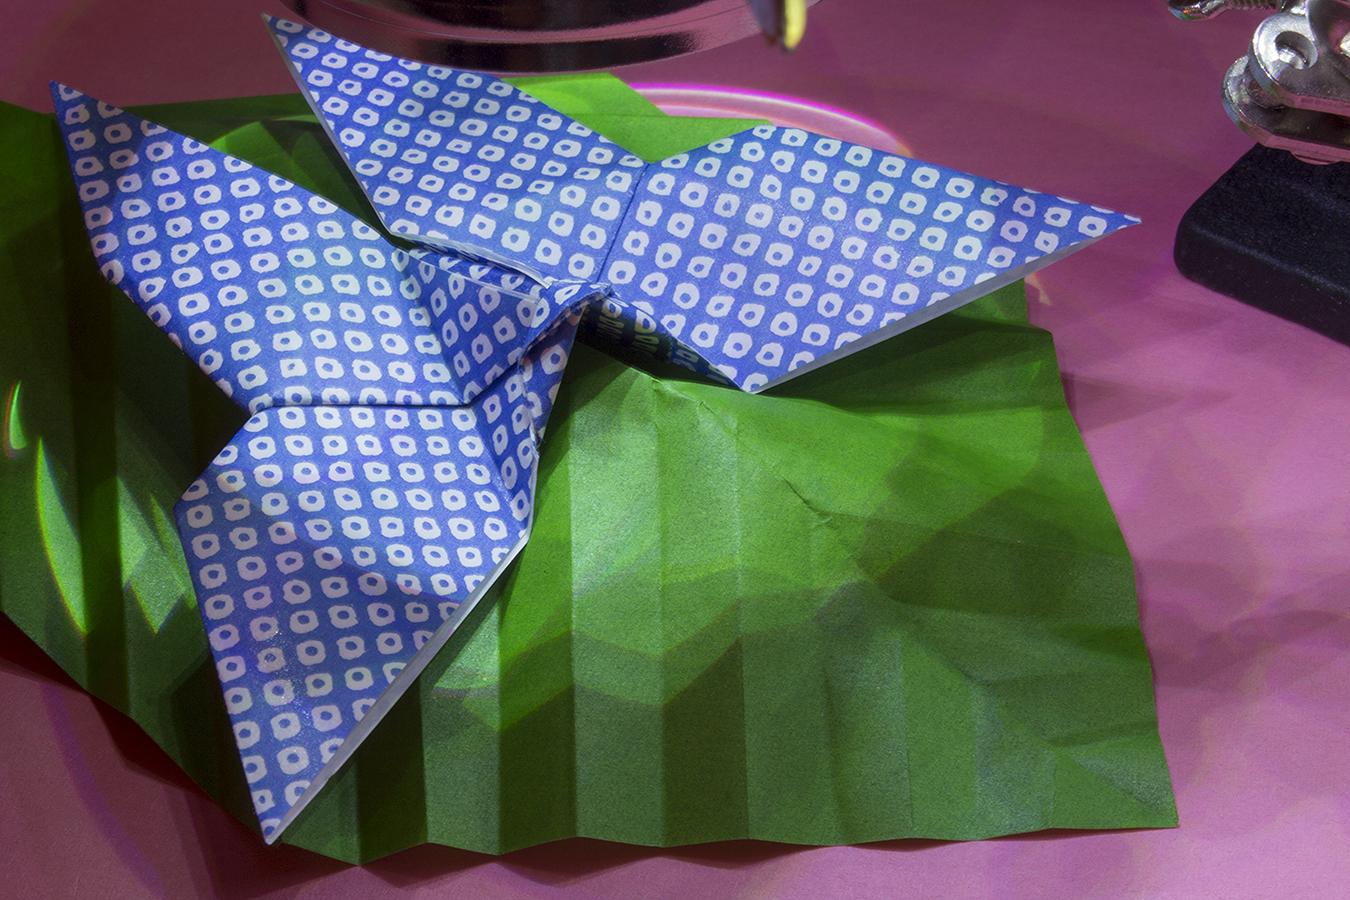 13_Leaf_Jonathan_Tang_UPenn_Tony_Ward_Studio_Long_Exposure_Low_Light_LED_Optics_Origami_Paper_Butterfly